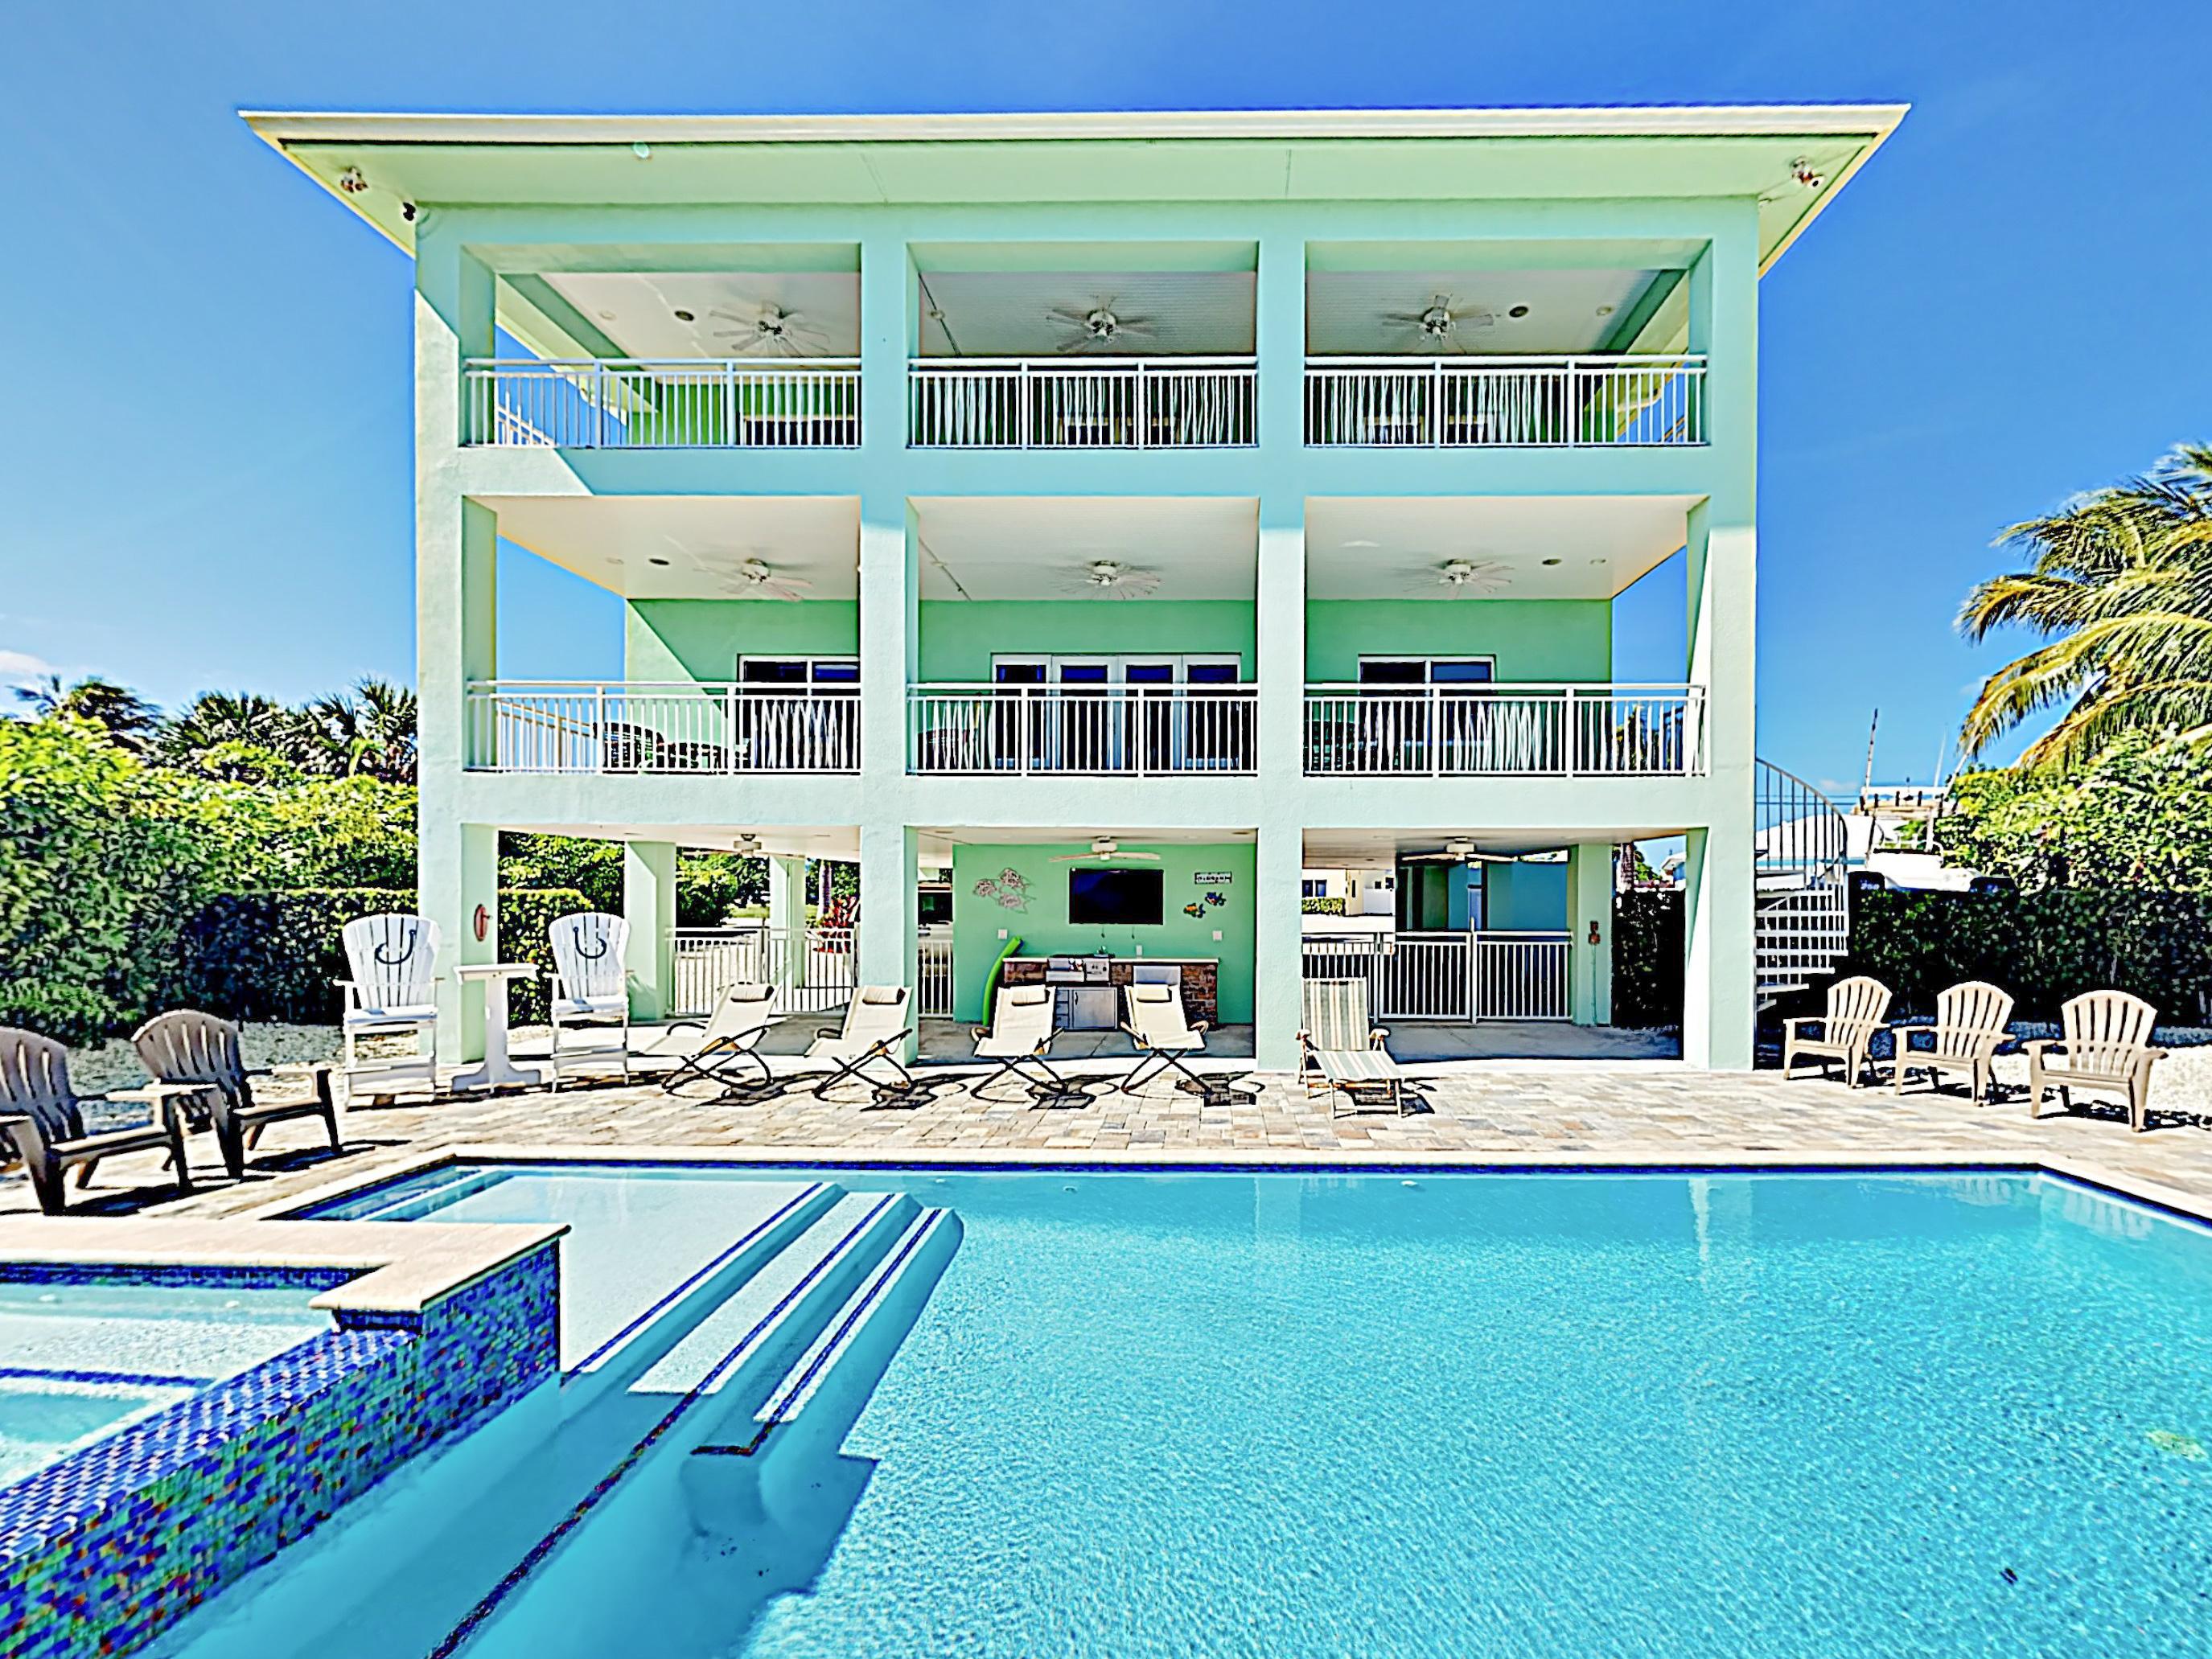 Marathon FL Vacation Rental Welcome to the